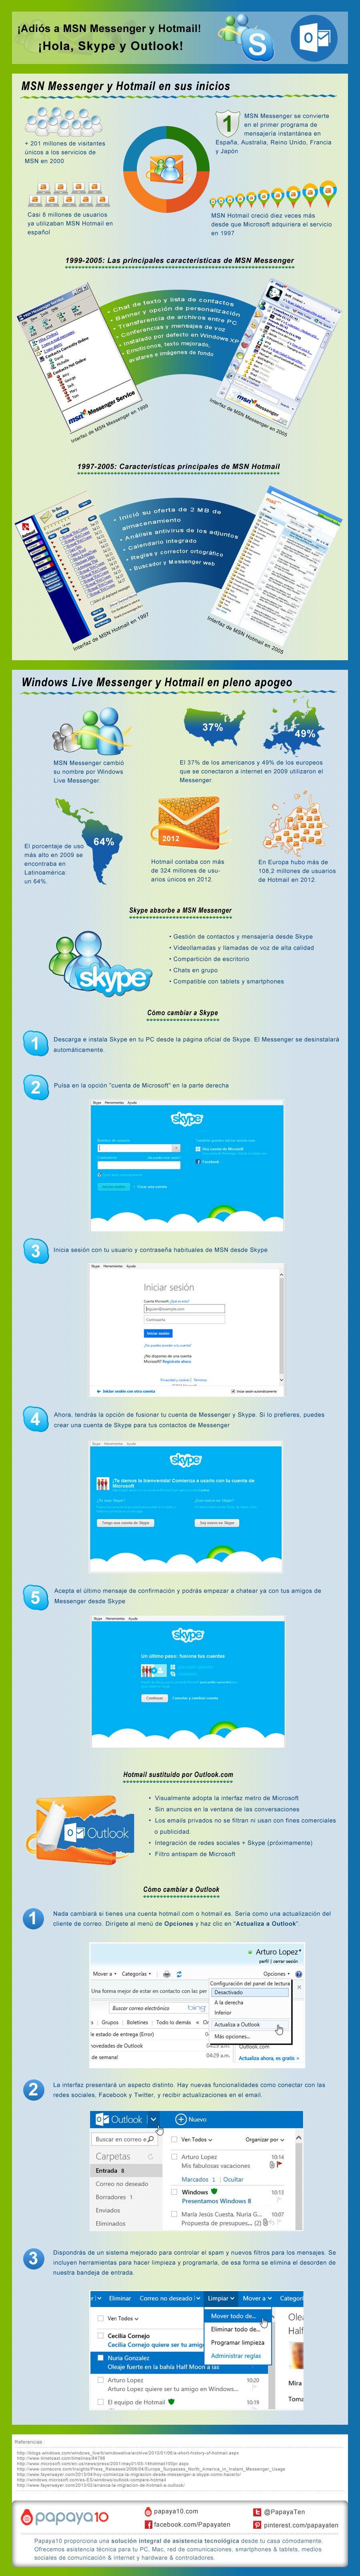 adios-MSN-Hotmail-papaya10